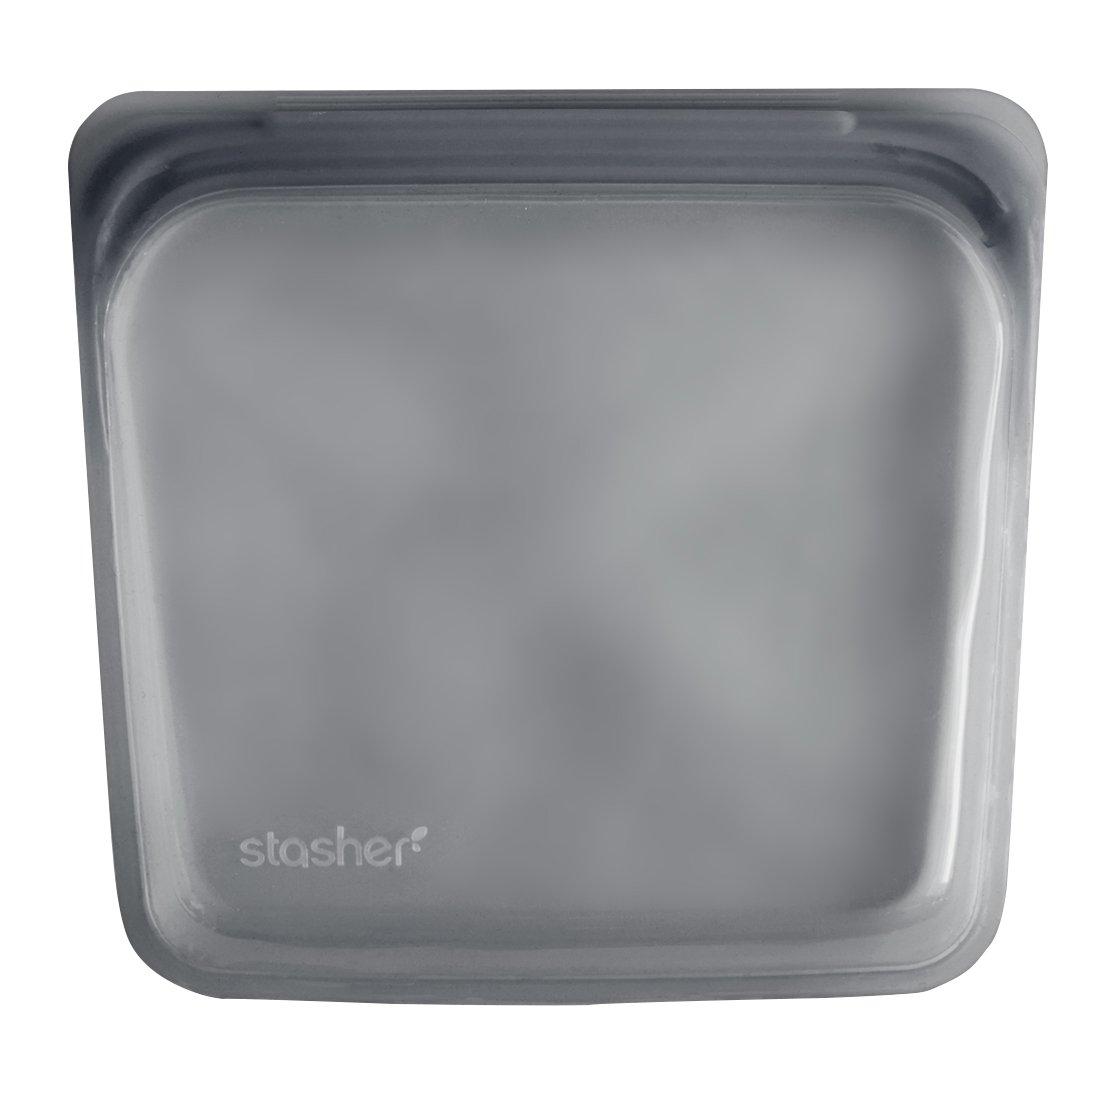 Stasher Reusable Silicone Food Bag, Sandwich Bag, Sous vide Bag, Grey STSB07